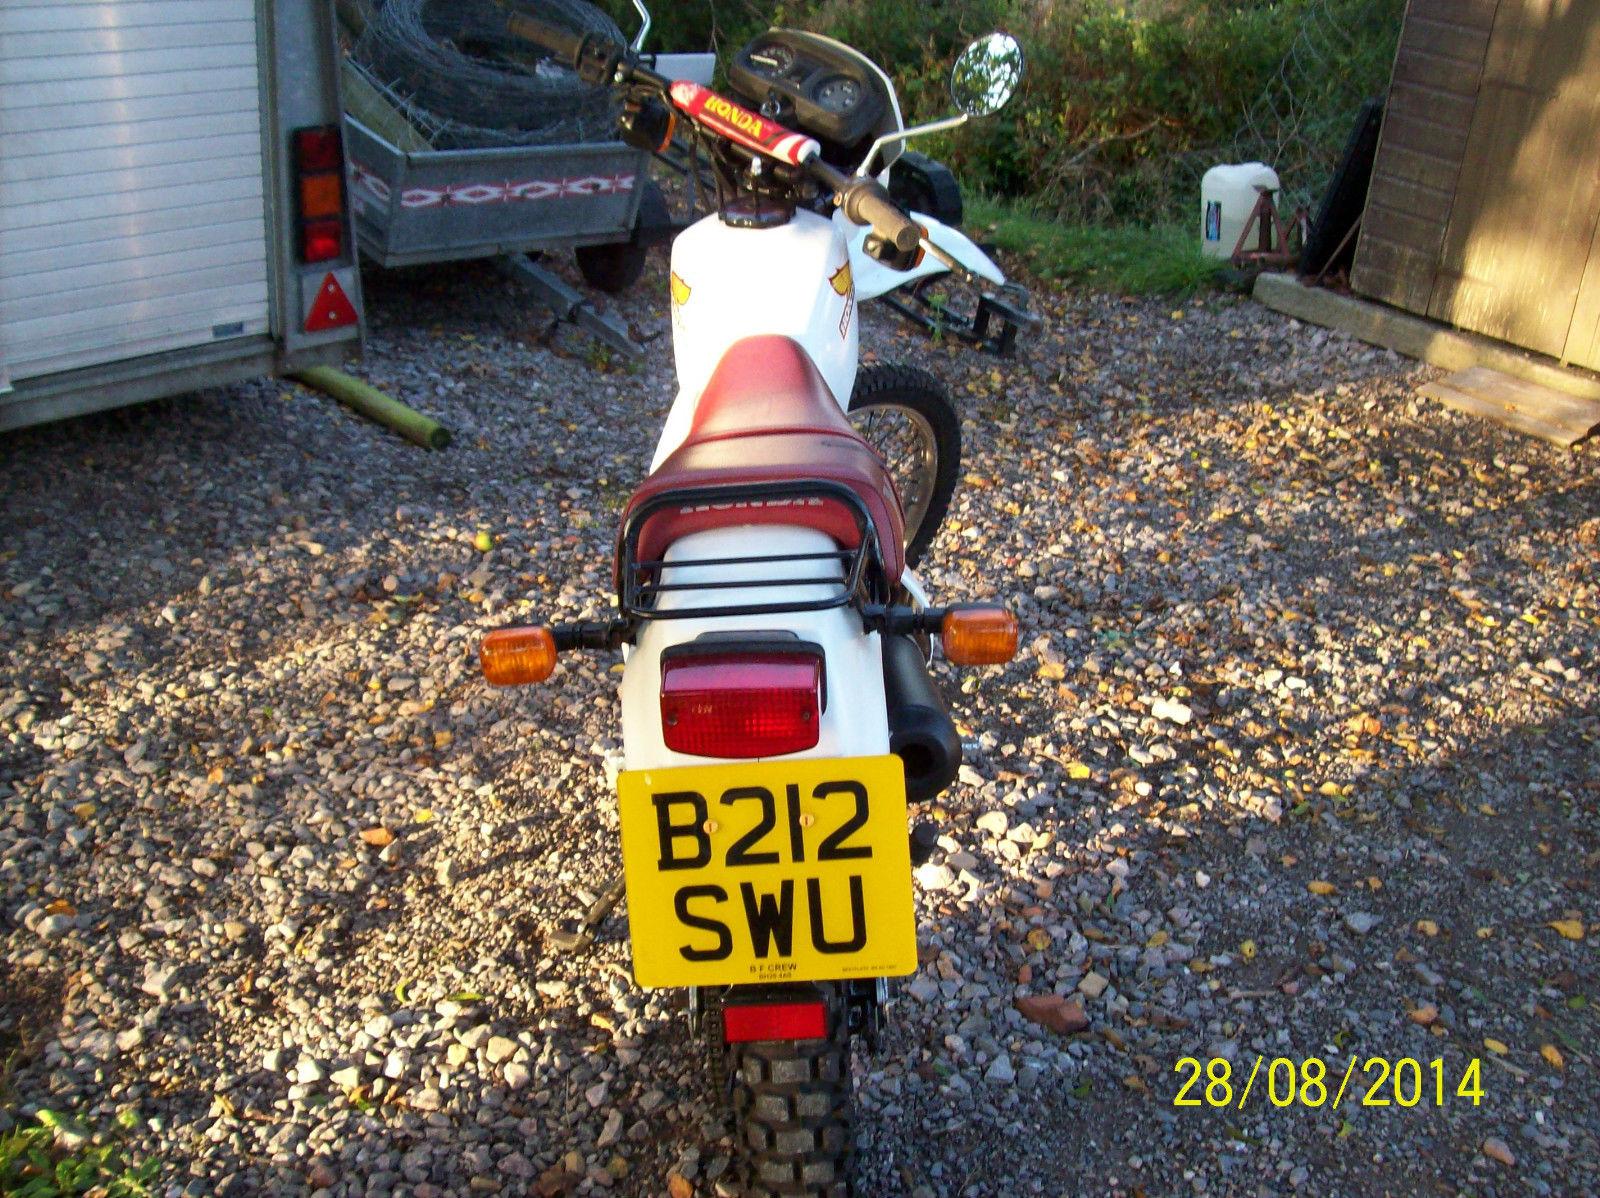 Honda Ct 90 K 1 Wiring Diagram Electrical Diagrams Ca77 Xl125rc Xl125r 1984 Cb450